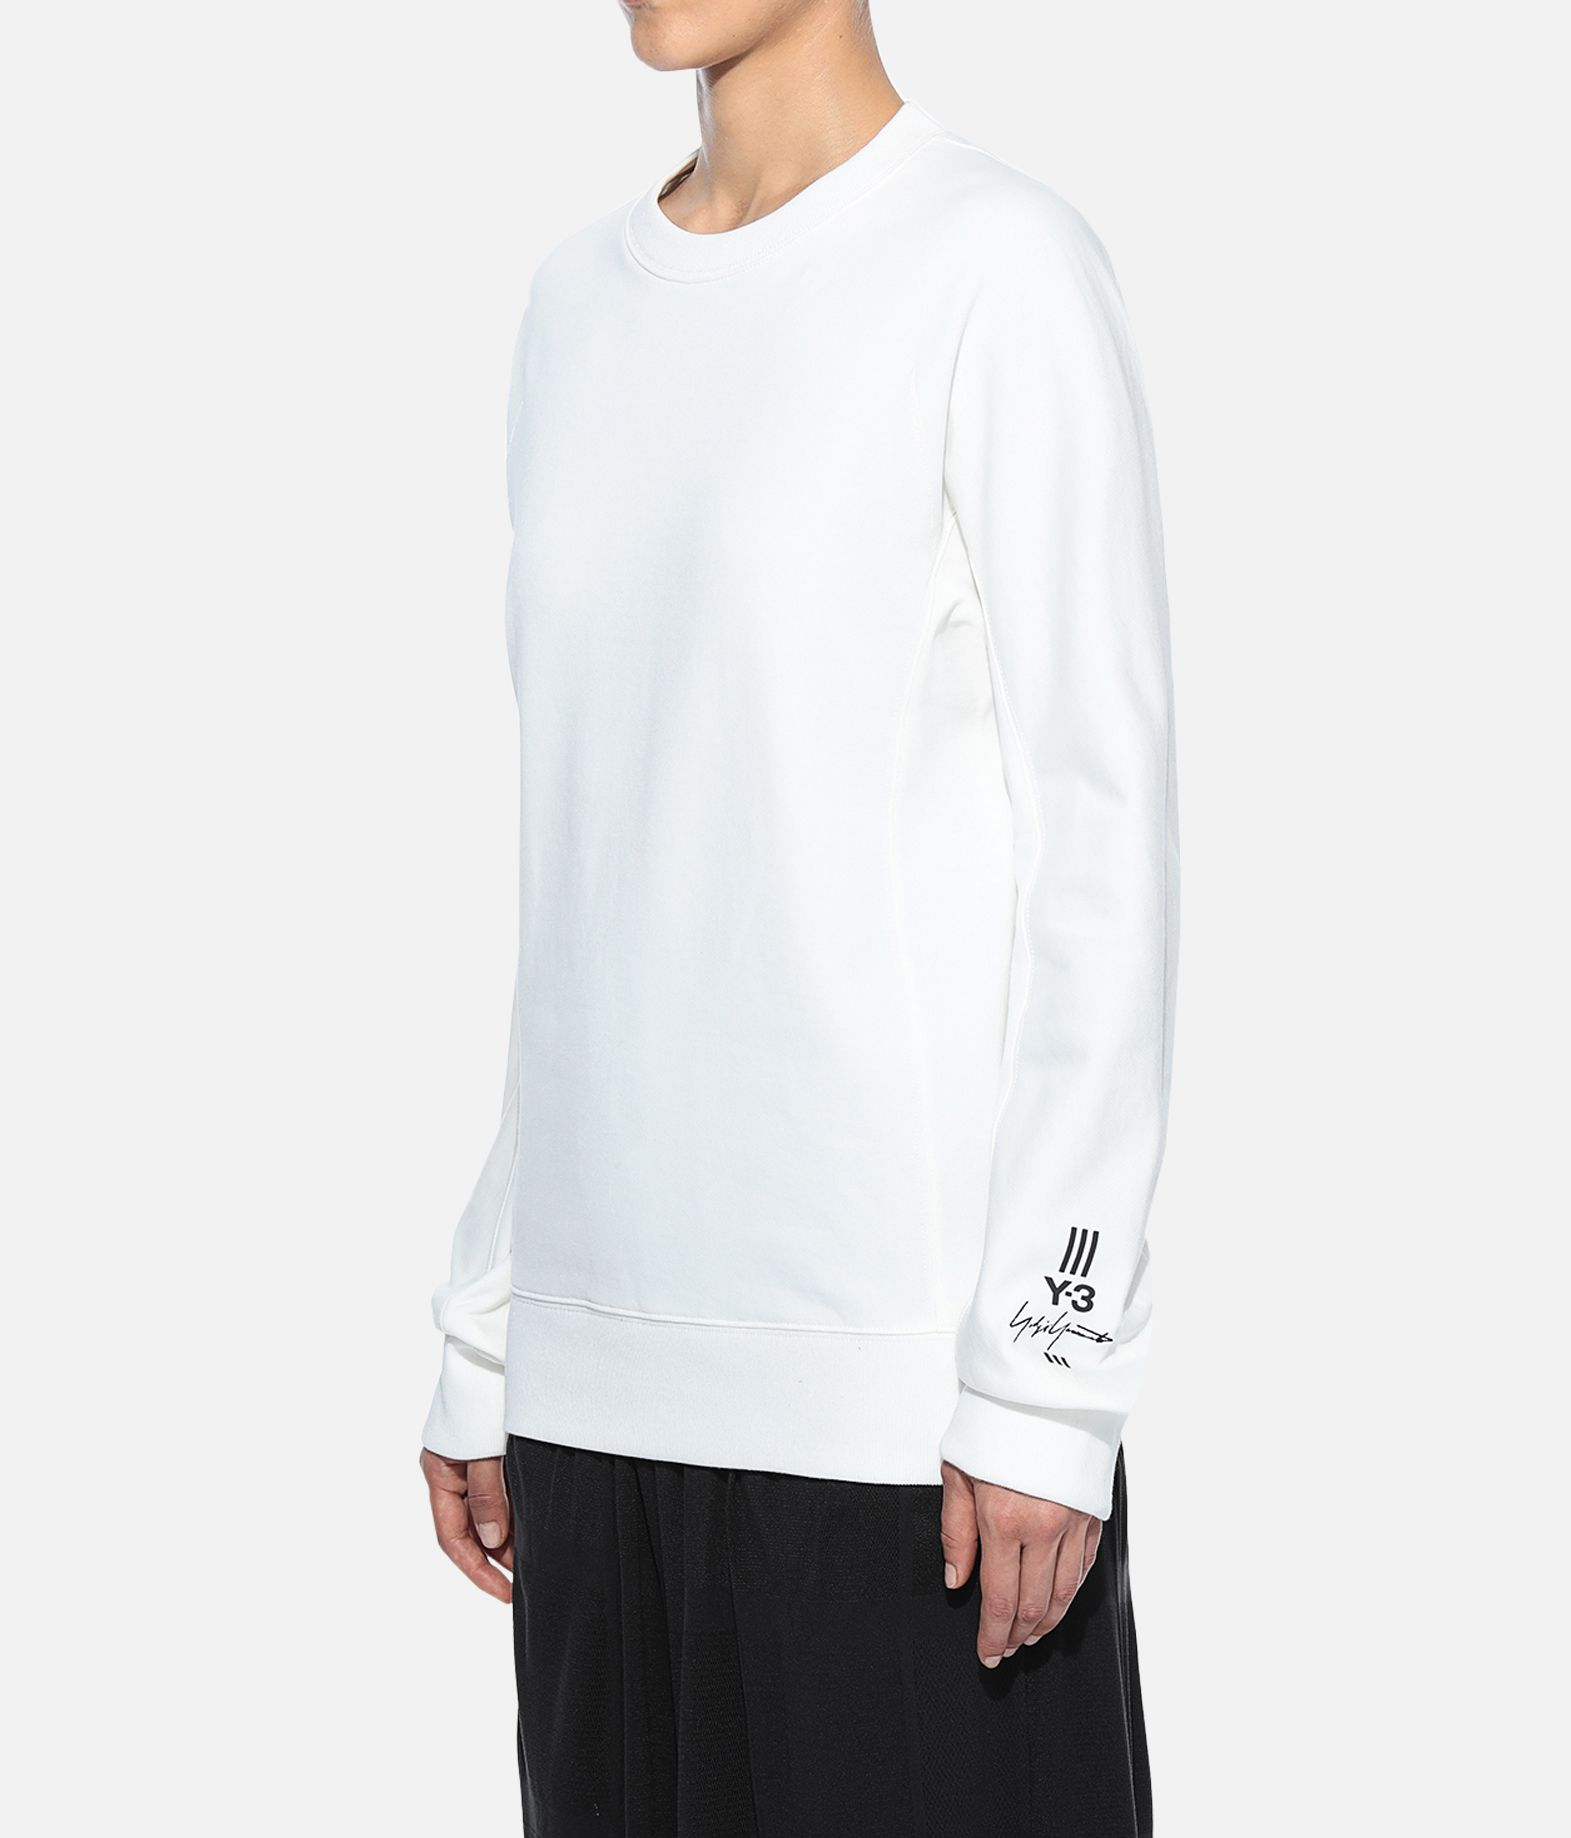 Y-3 Y-3 Classic Sweater Sweatshirt Damen e